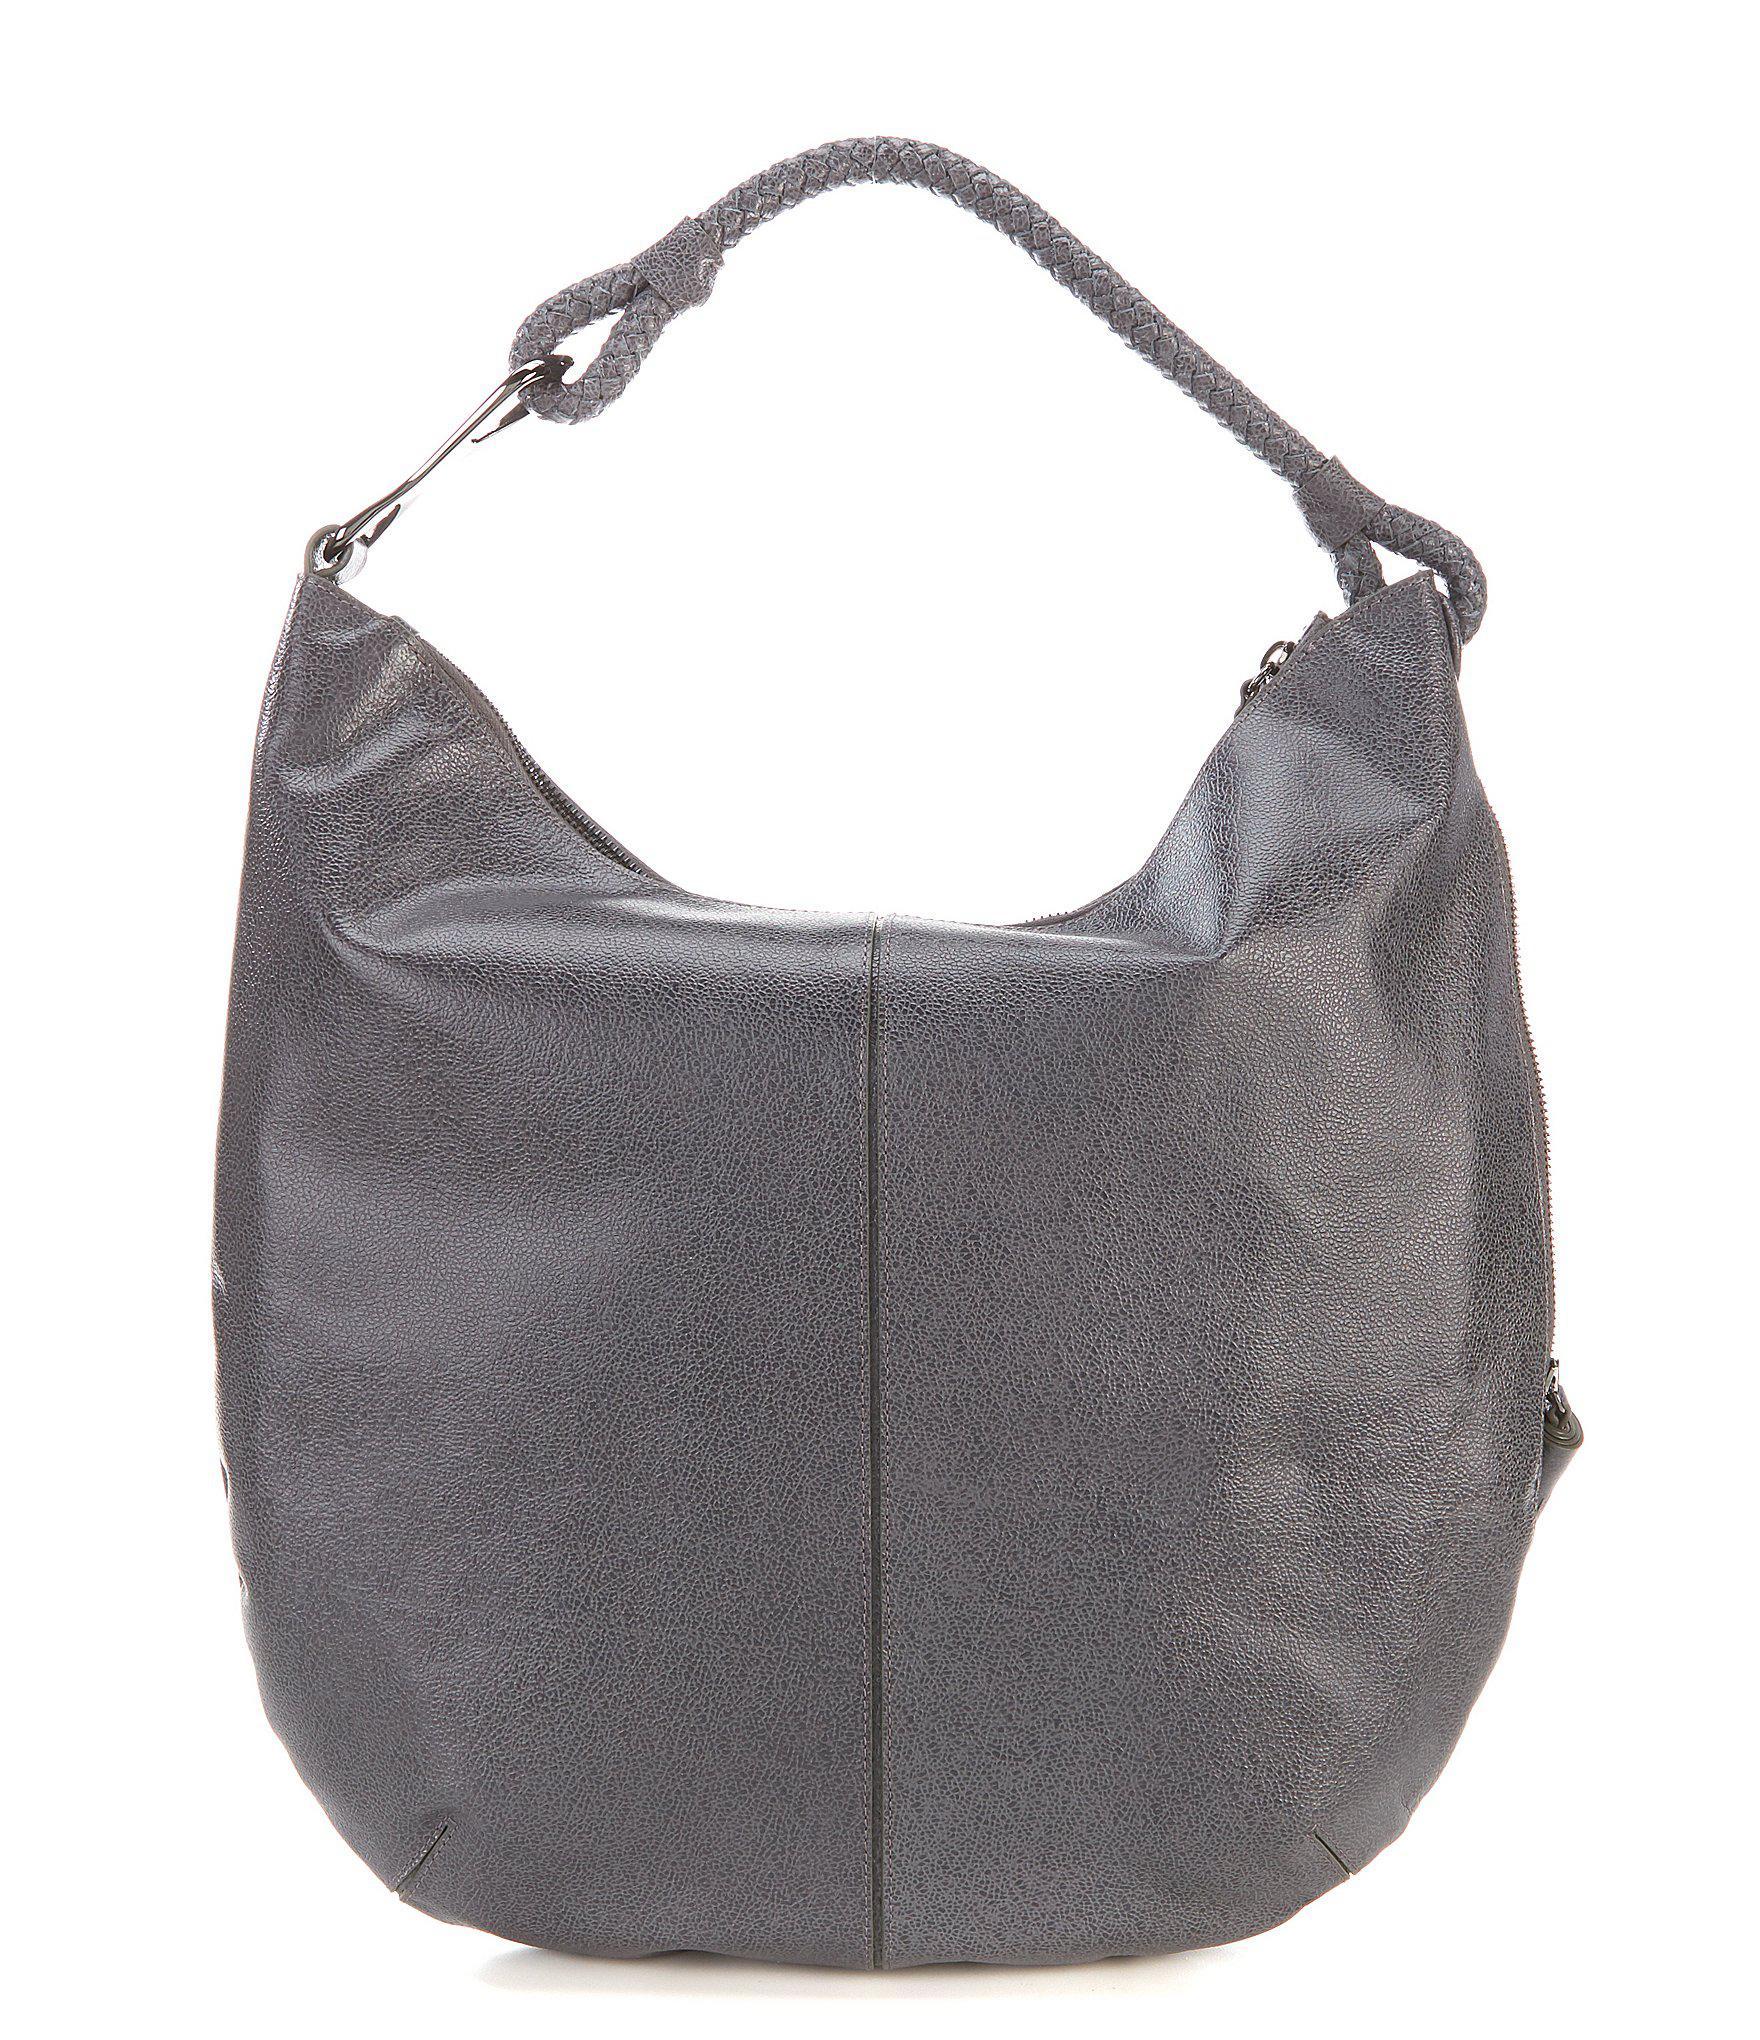 b5aa976925 Lyst - Halston Elsa Large Tassel Hobo Bag in Gray